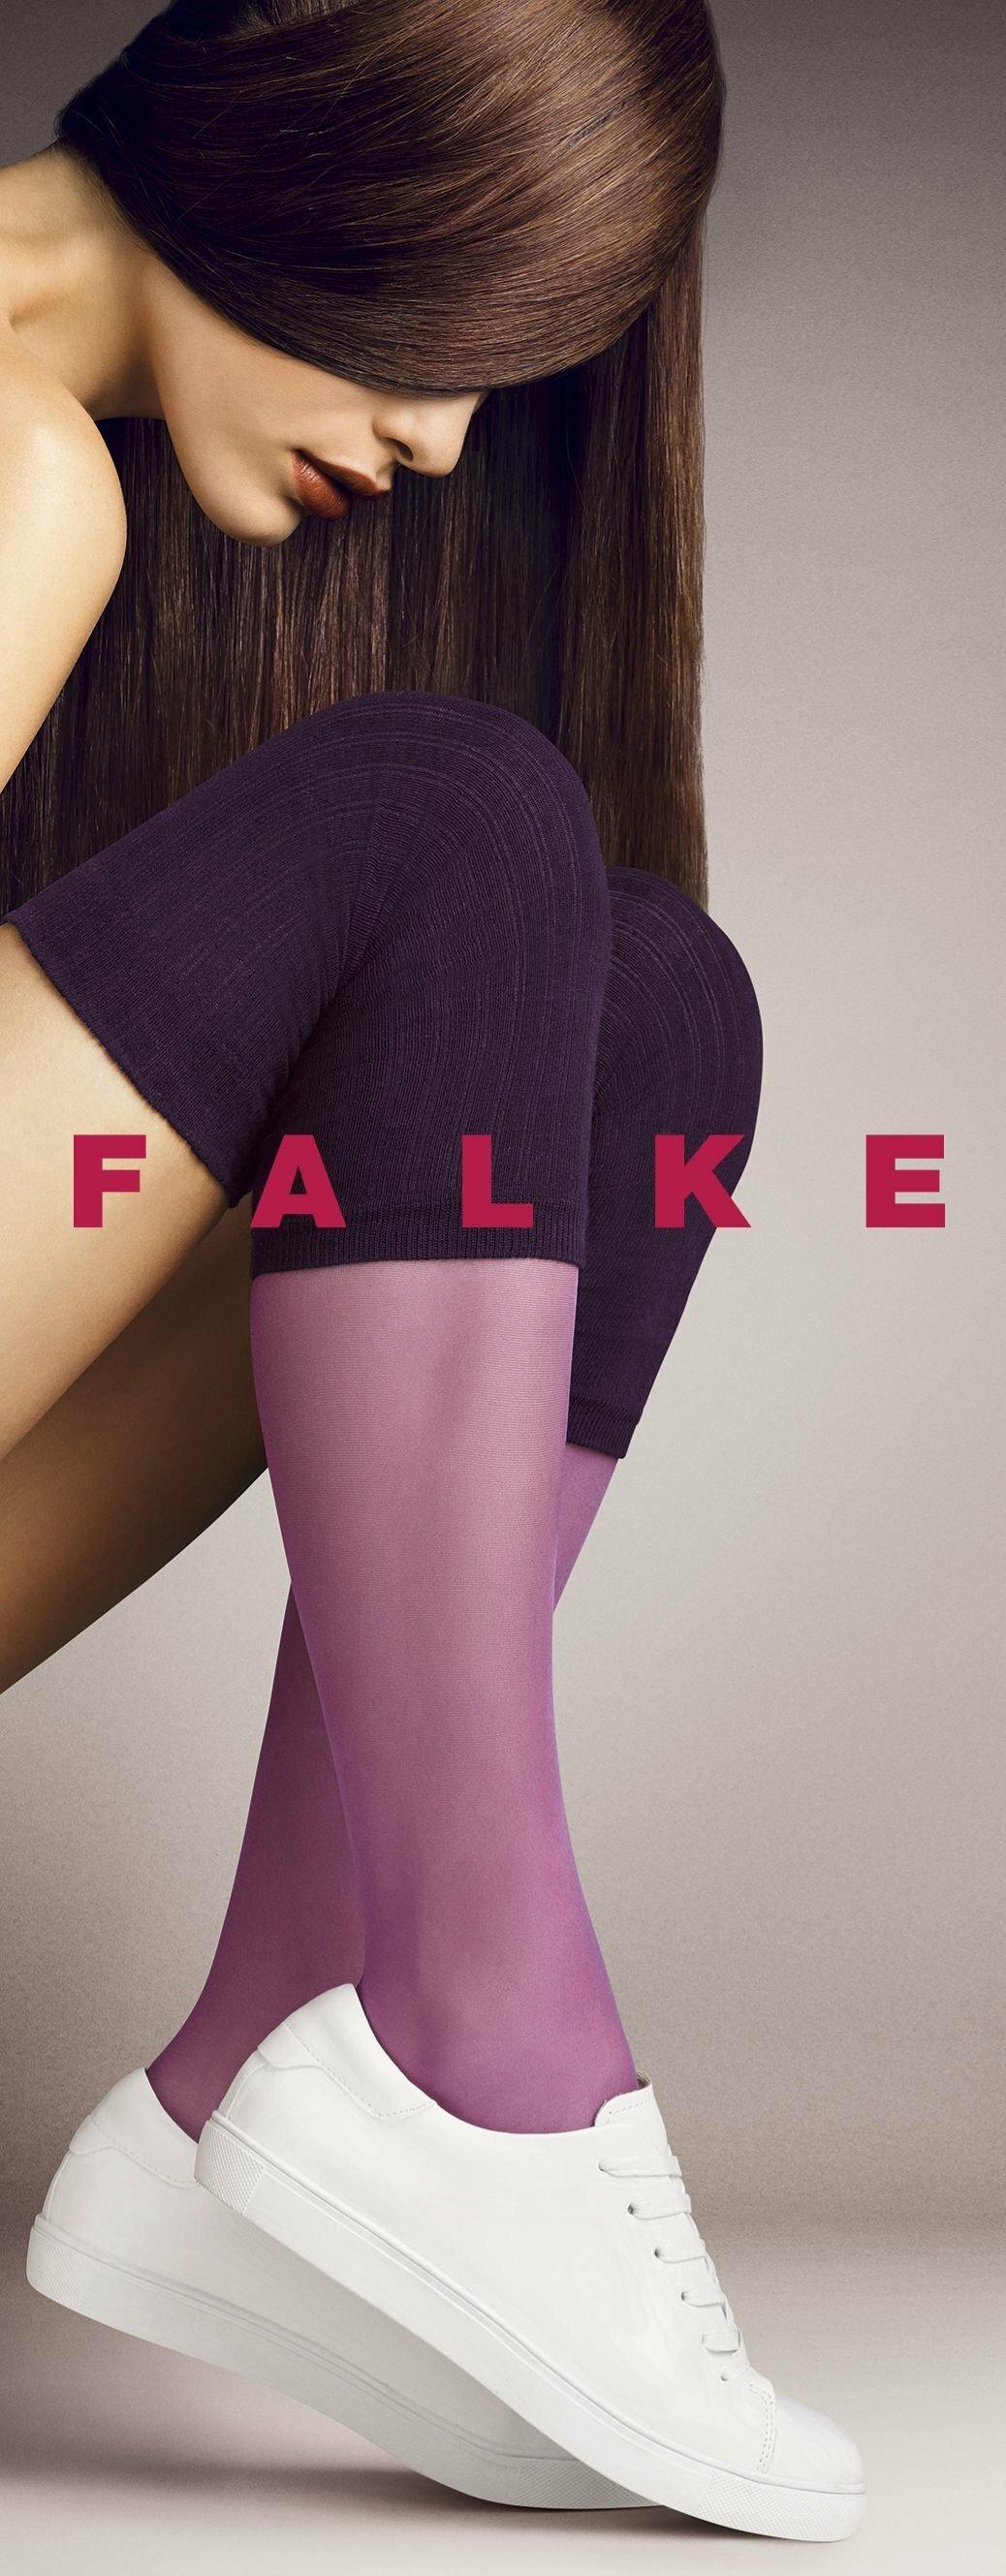 FALKE silk smooth 15 DEN ladies knee socks ANTHRACITE